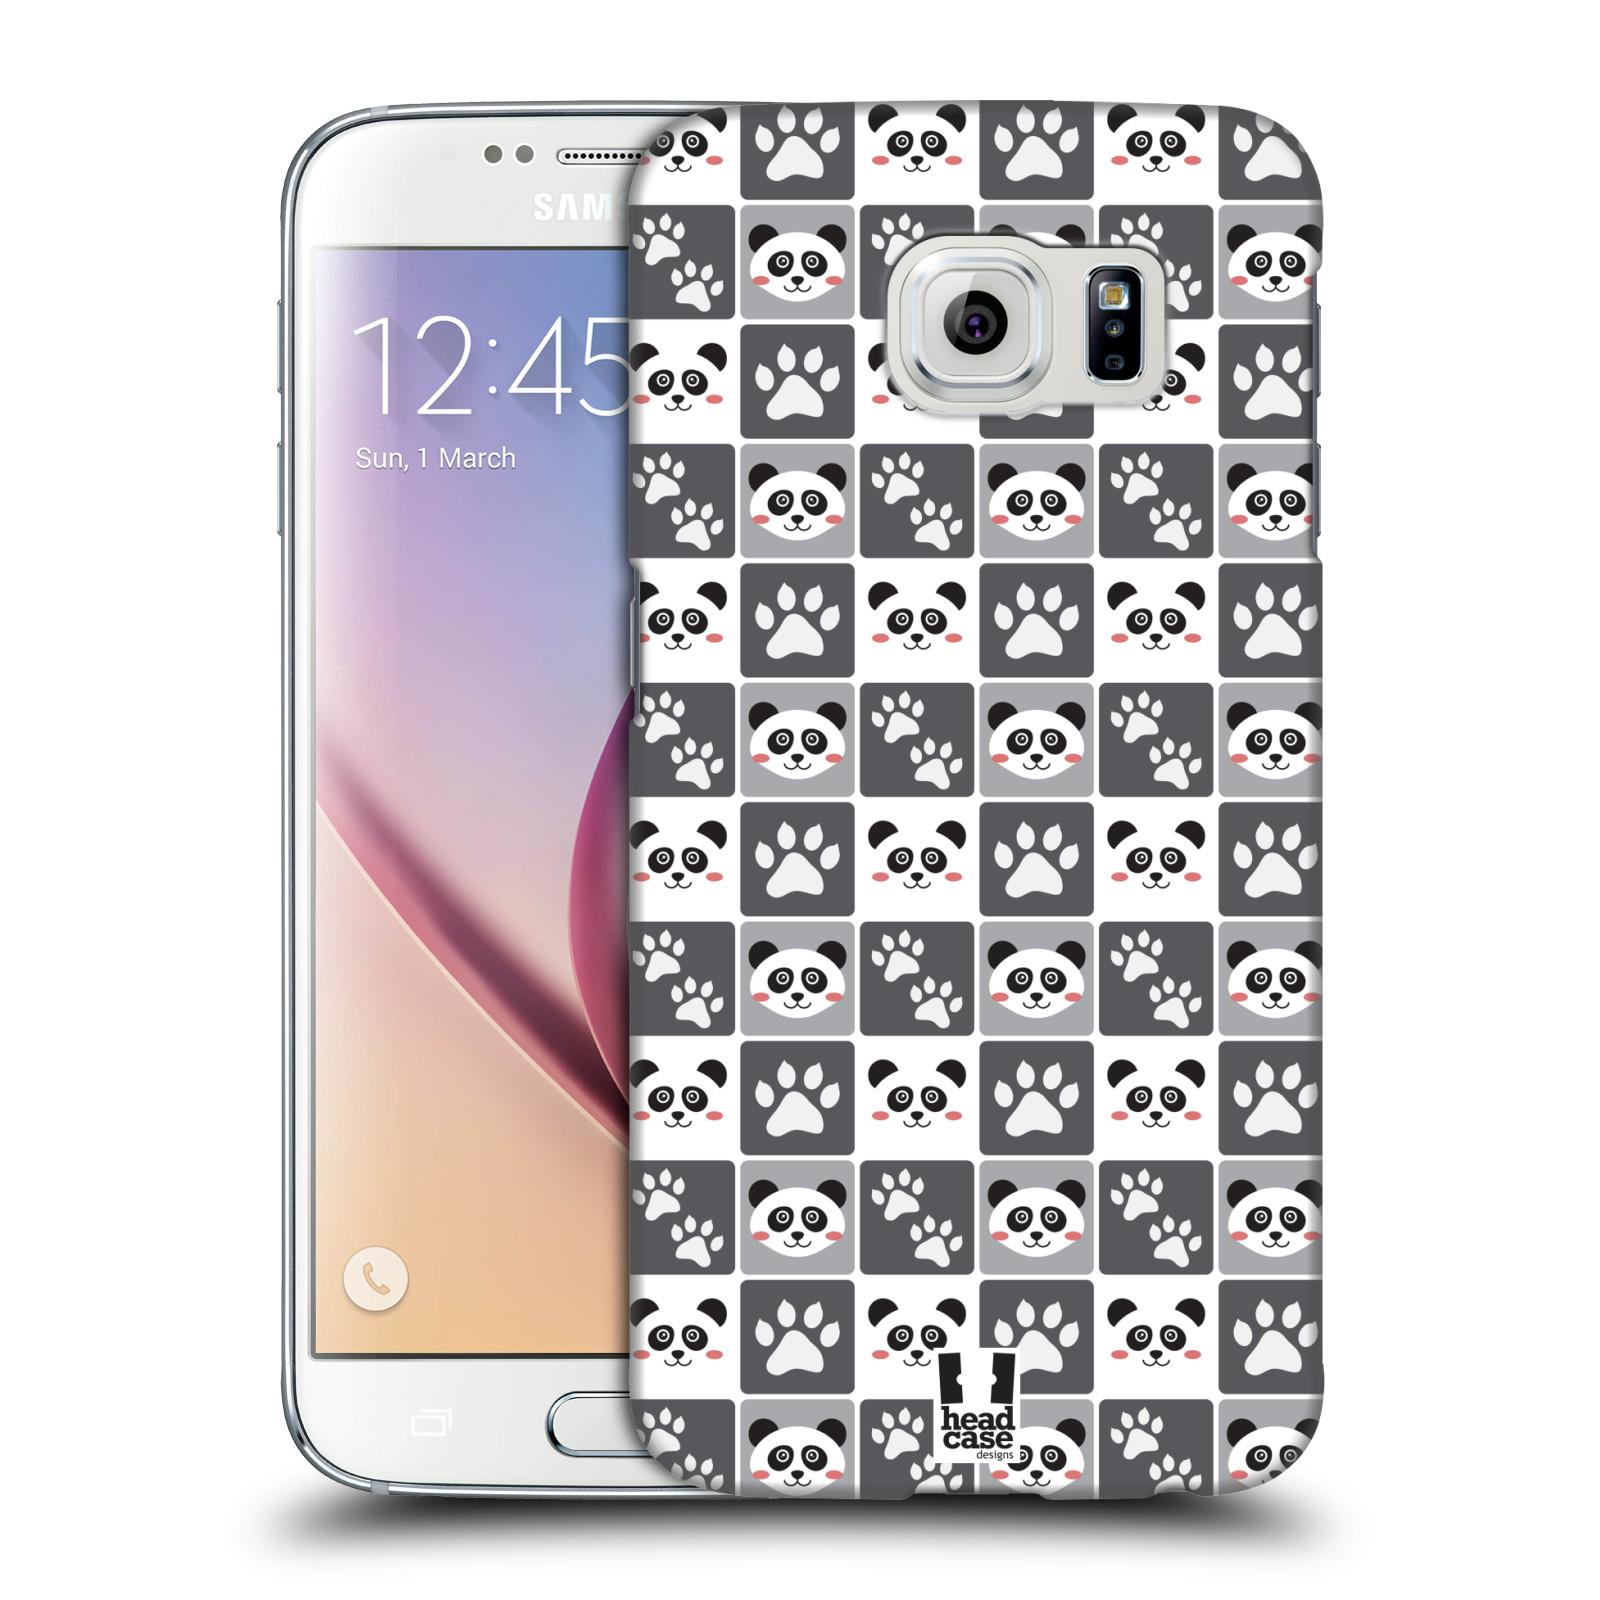 HEAD CASE plastový obal na mobil SAMSUNG Galaxy S6 (G9200, G920F) vzor Zvířecí razítka MEDVÍDEK PANDA